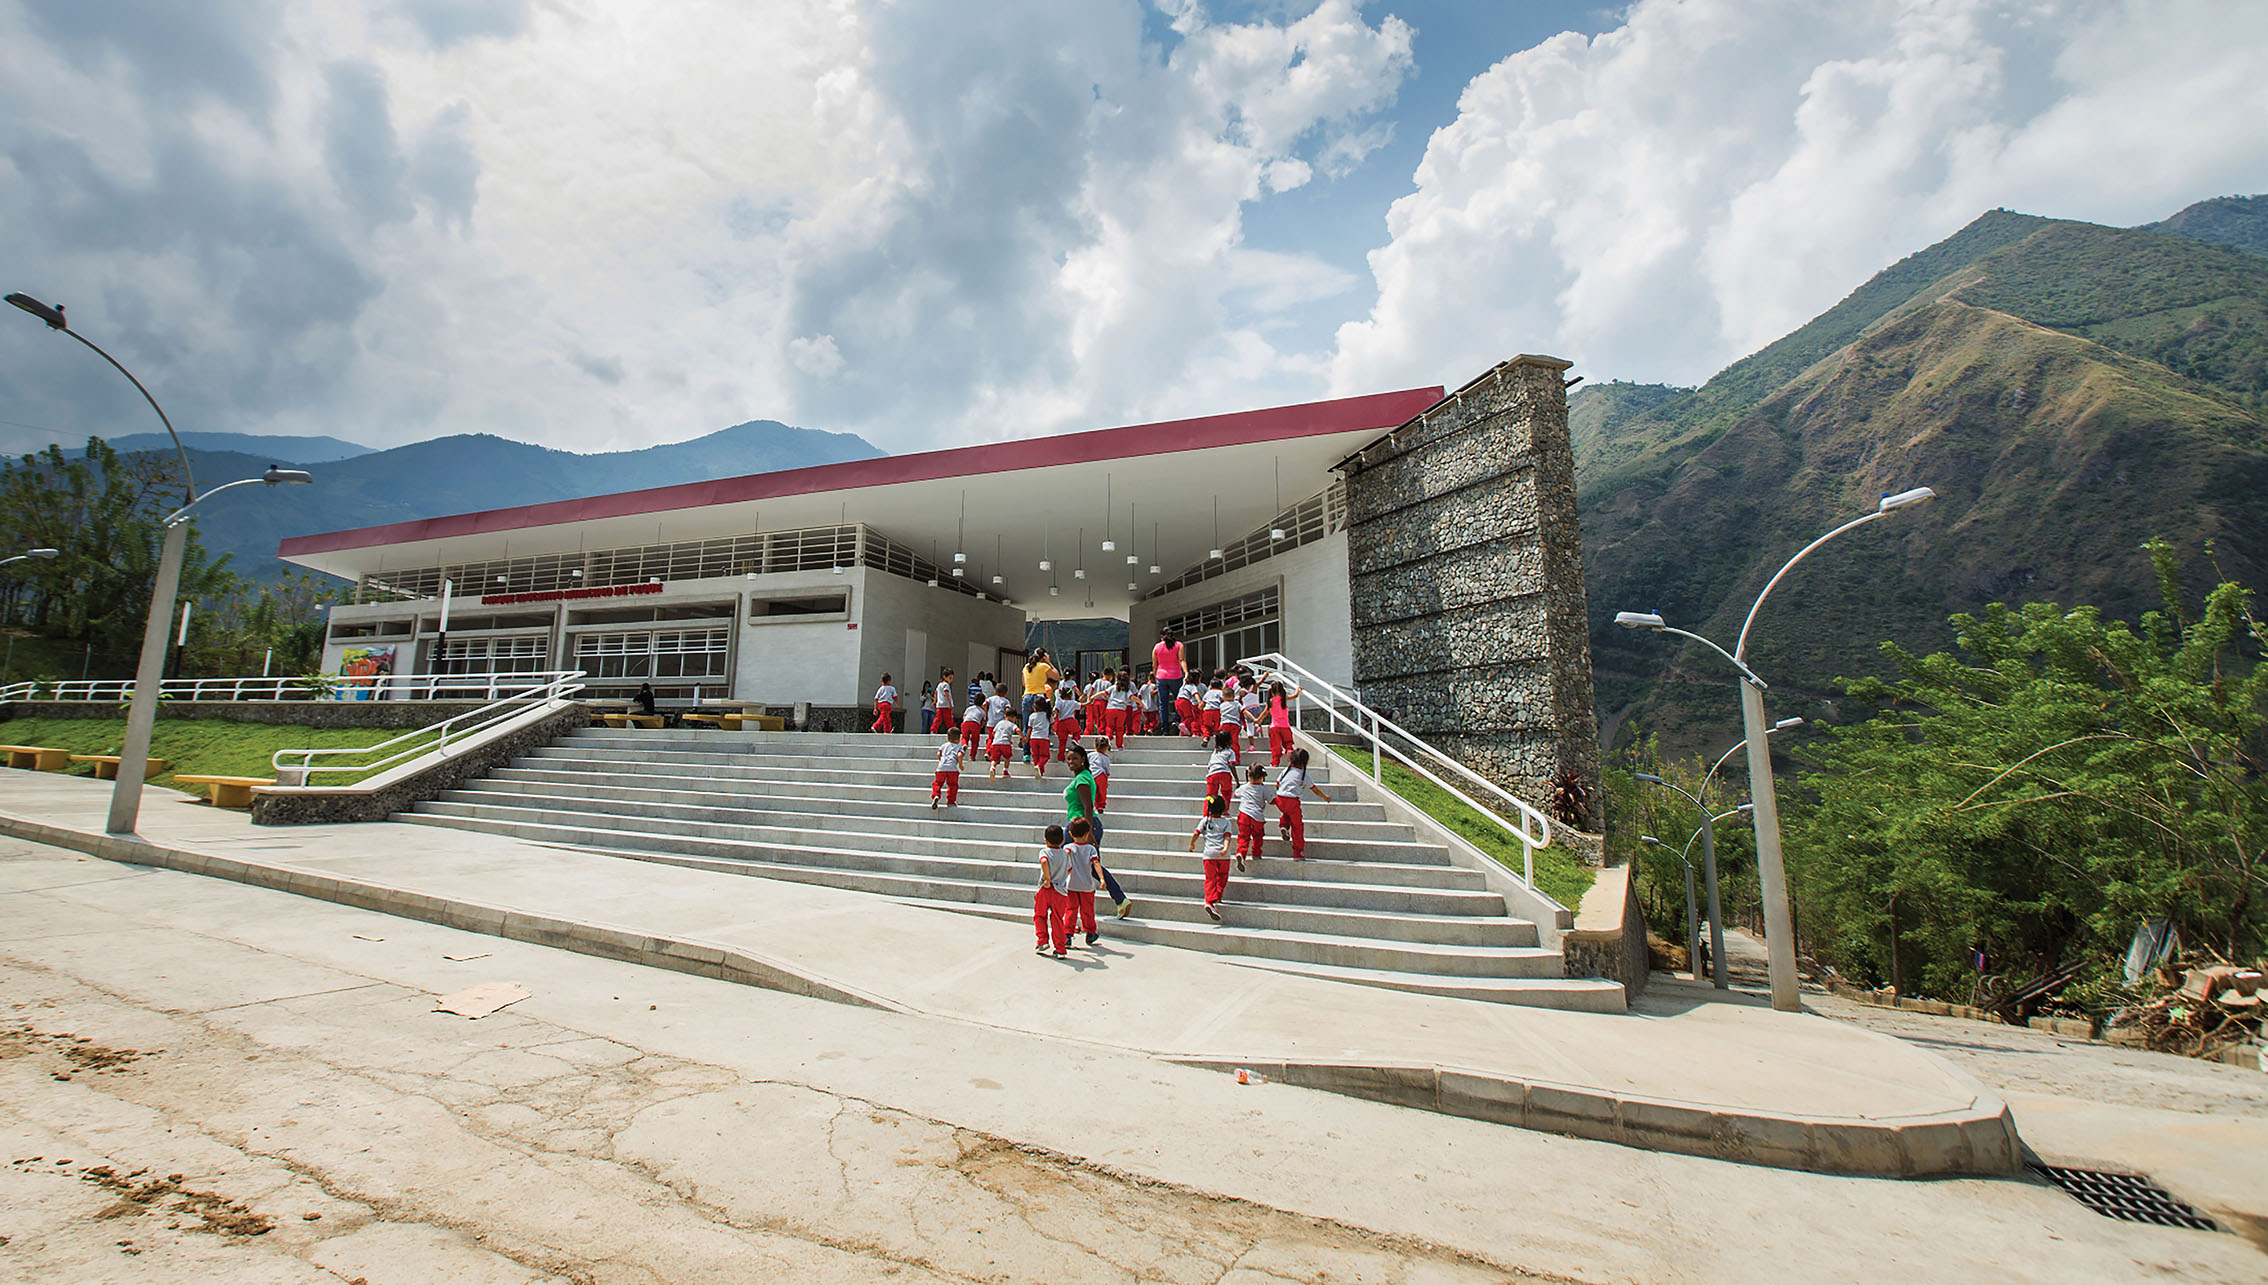 A new school in Peque, Antioquia, built by Governor Sergio Fajardo (2012–2016).  (Photo courtesy of Sergio Fajardo.)